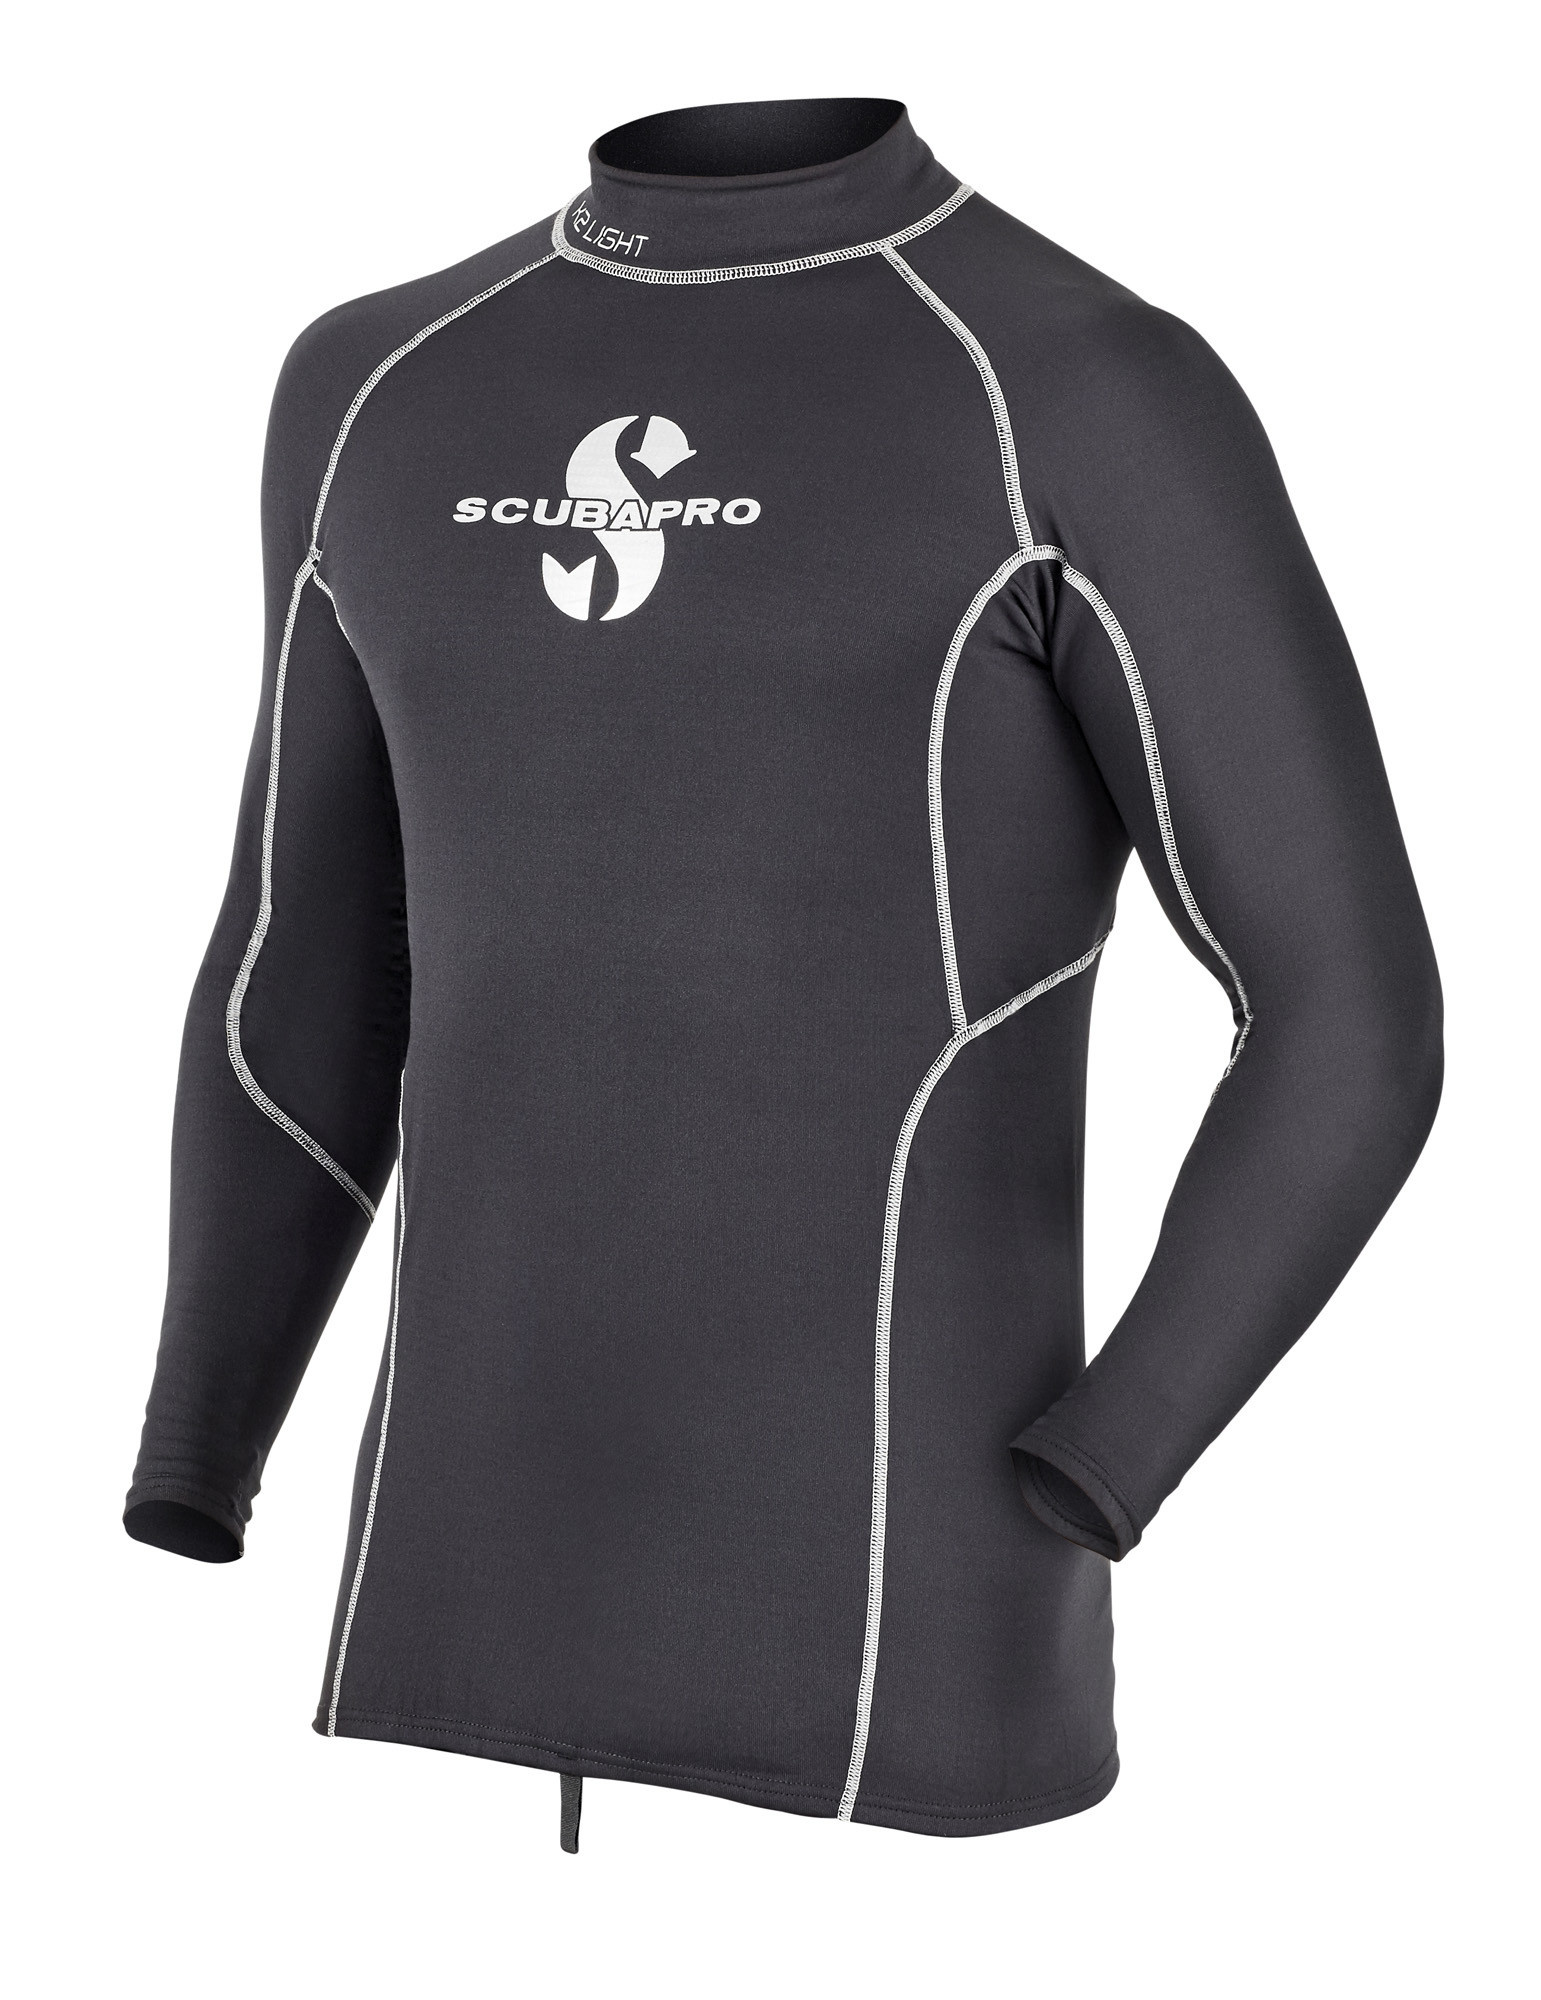 K2 Light Heren shirt-1